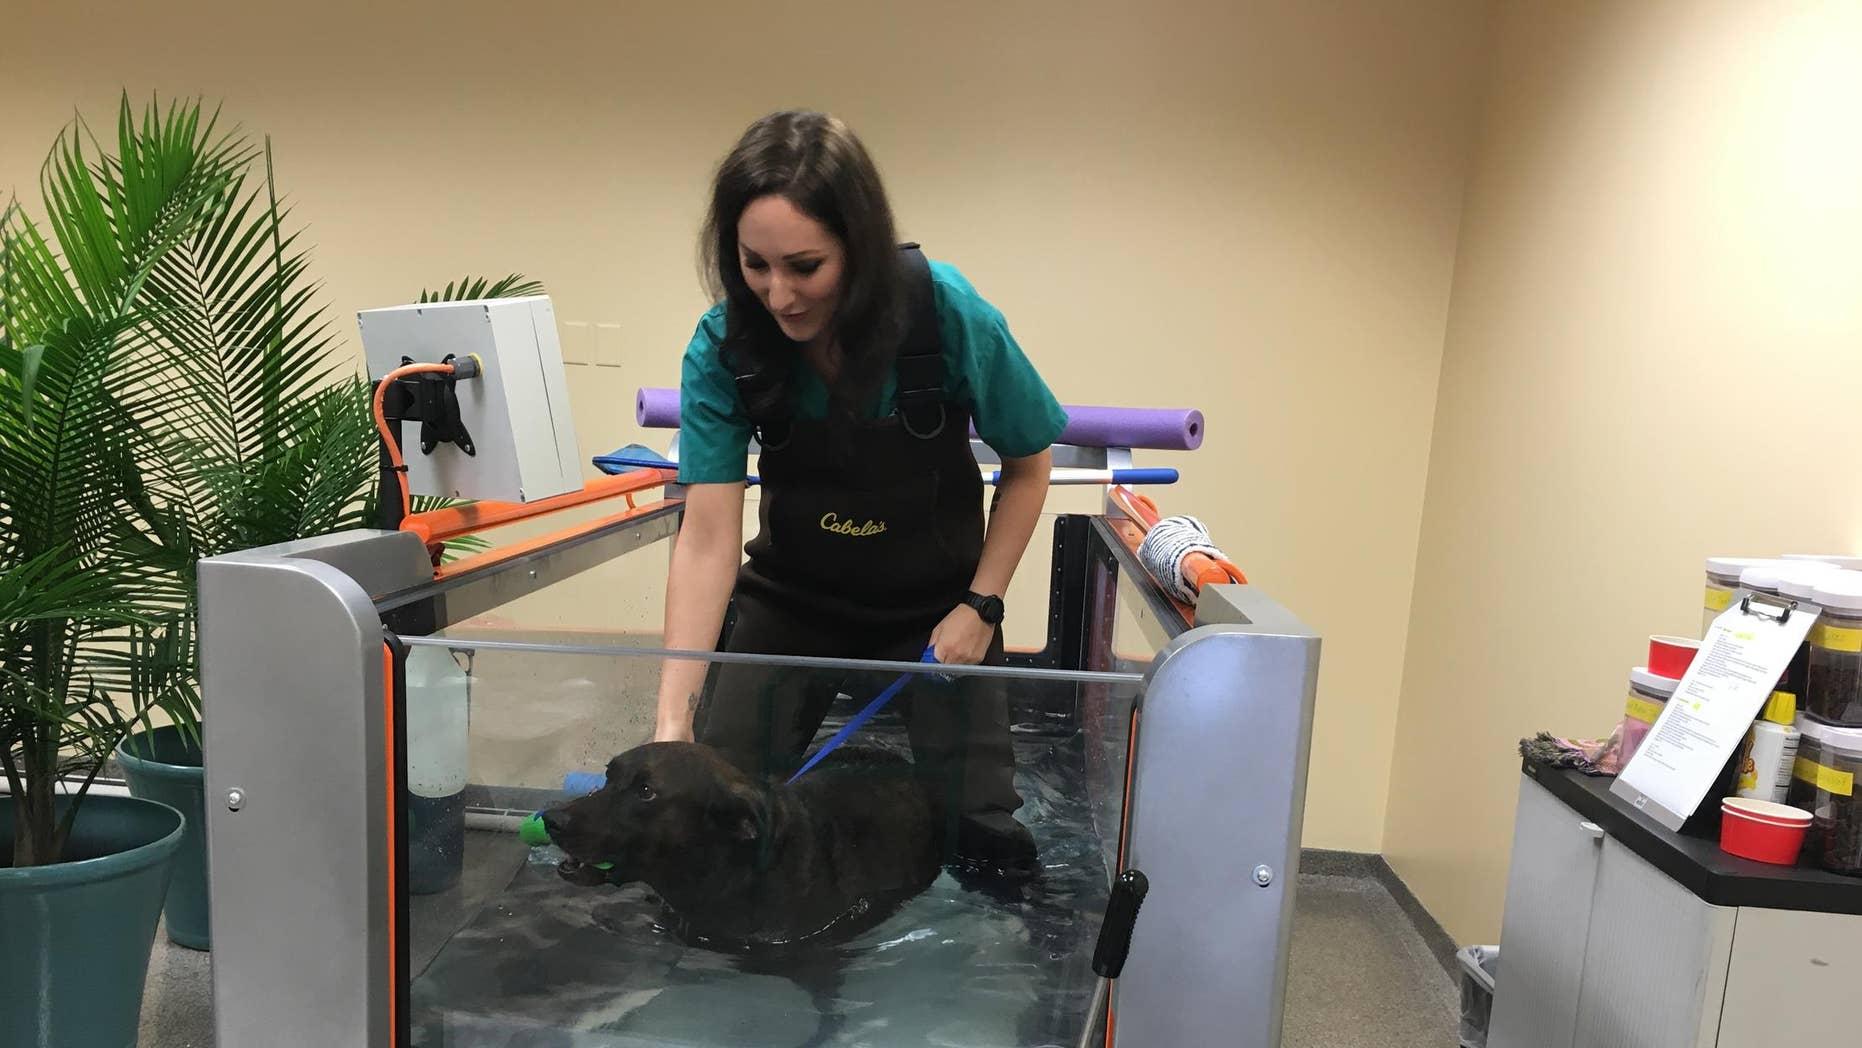 Rehab technician Erica Seils helps Max, who suffers from arthritis, walk on an underwater treadmill. Photography by Cindy Kuzma.